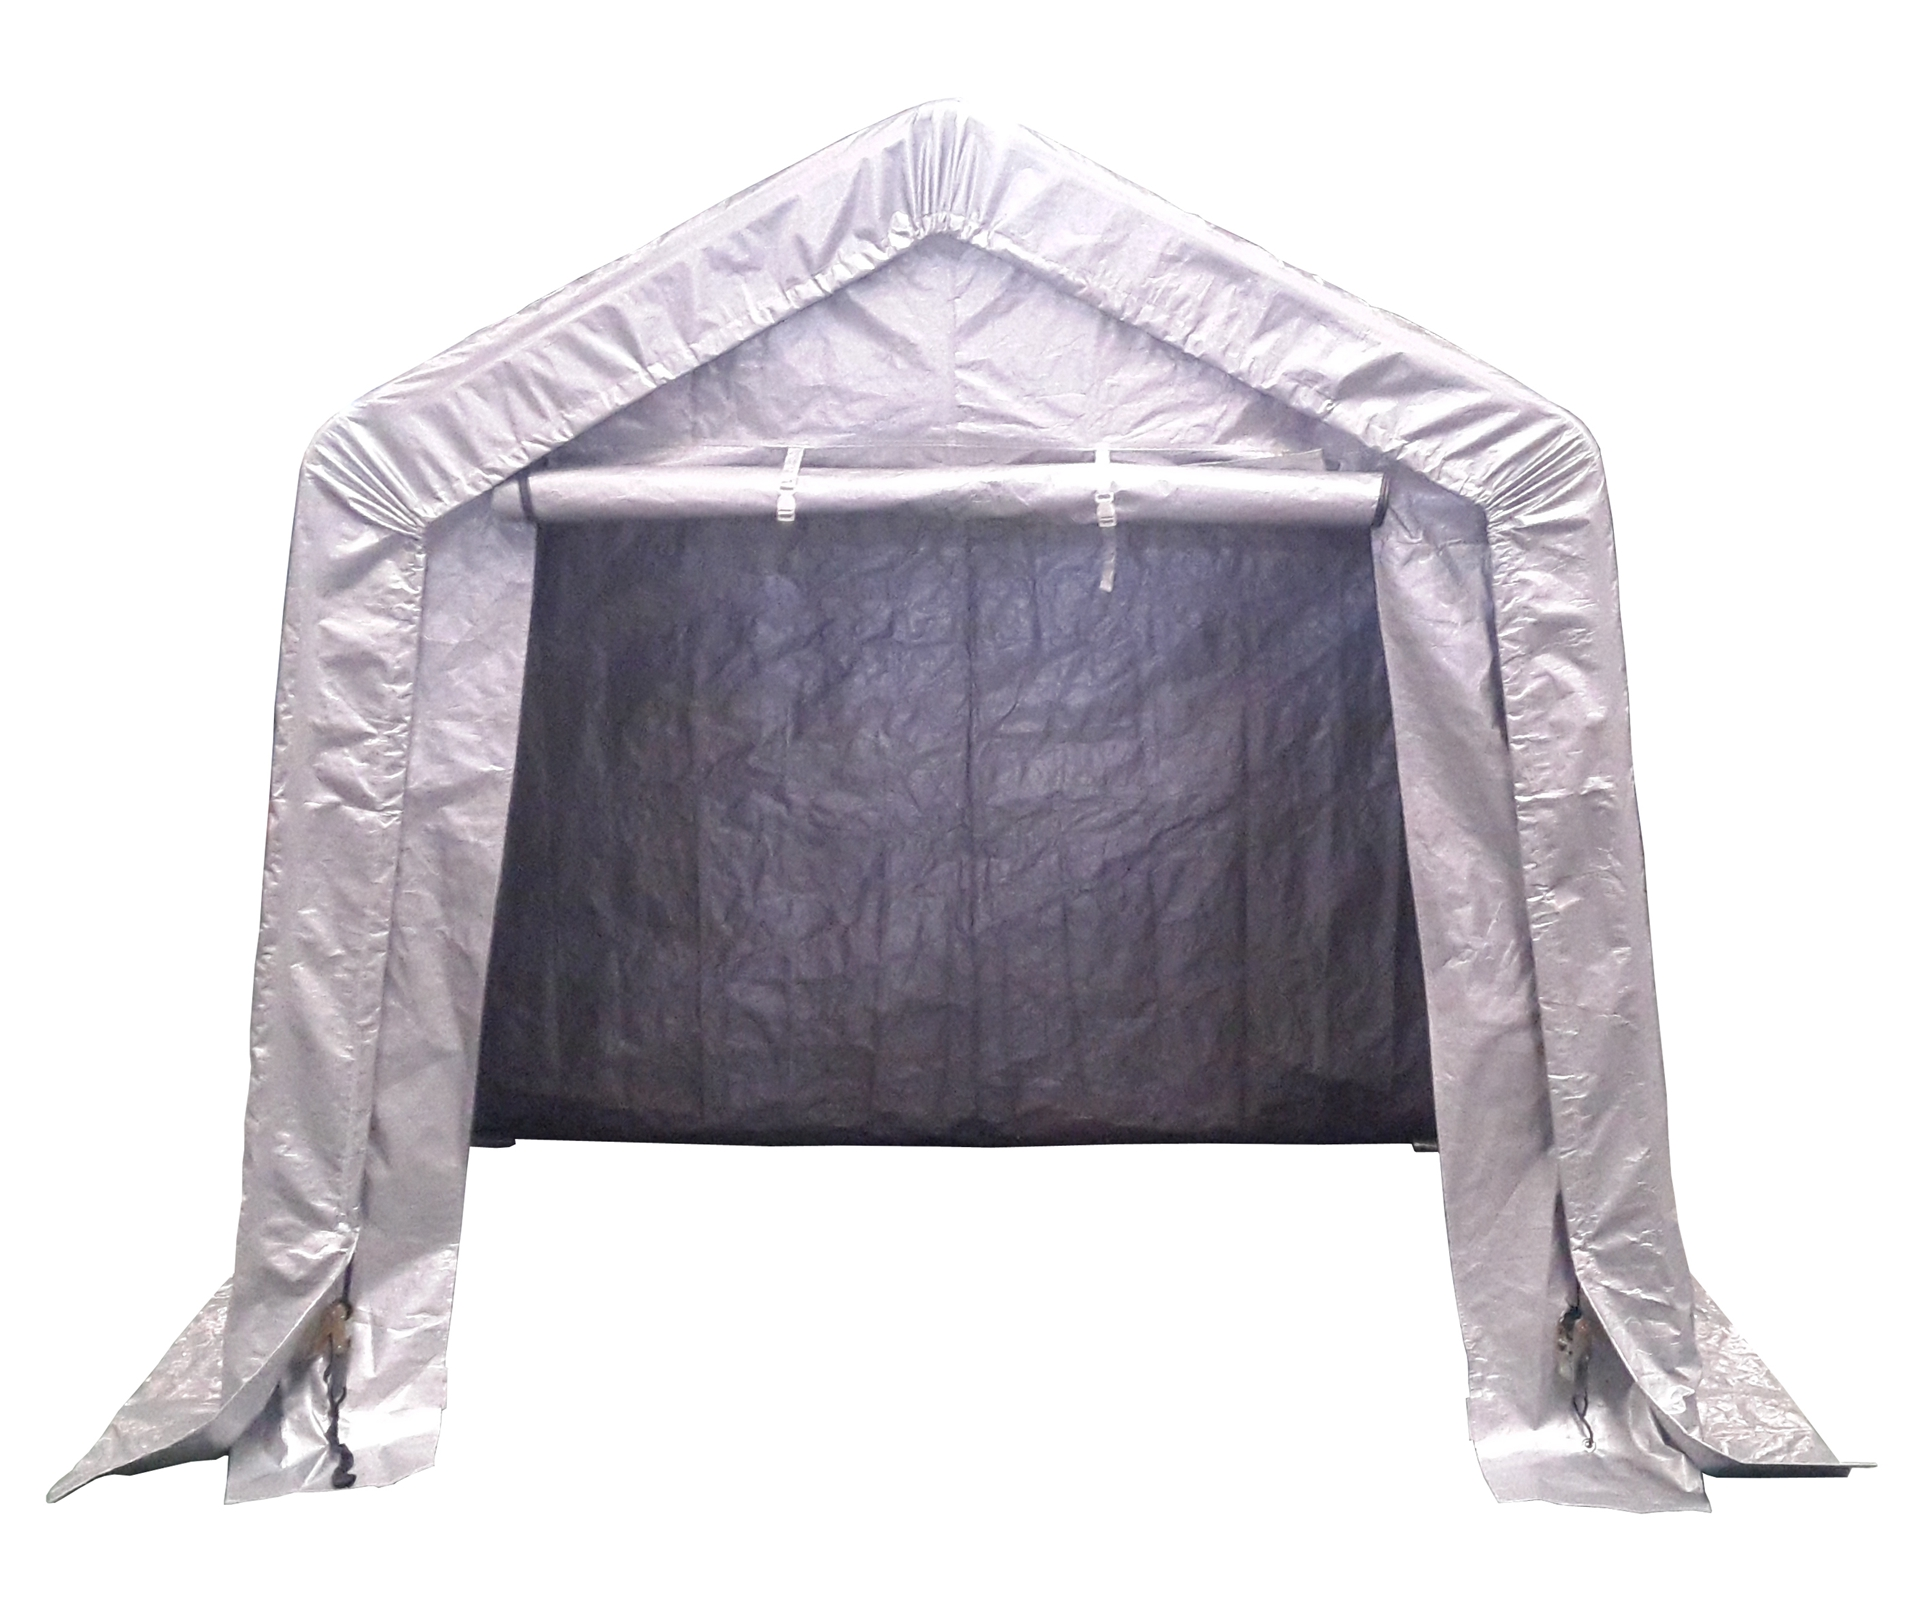 FoxHunter-Waterproof-Motor-Bike-Cover-Storage-Shed-Tent-  sc 1 st  eBay & FoxHunter Waterproof Motor Bike Cover Storage Shed Tent Garage ...